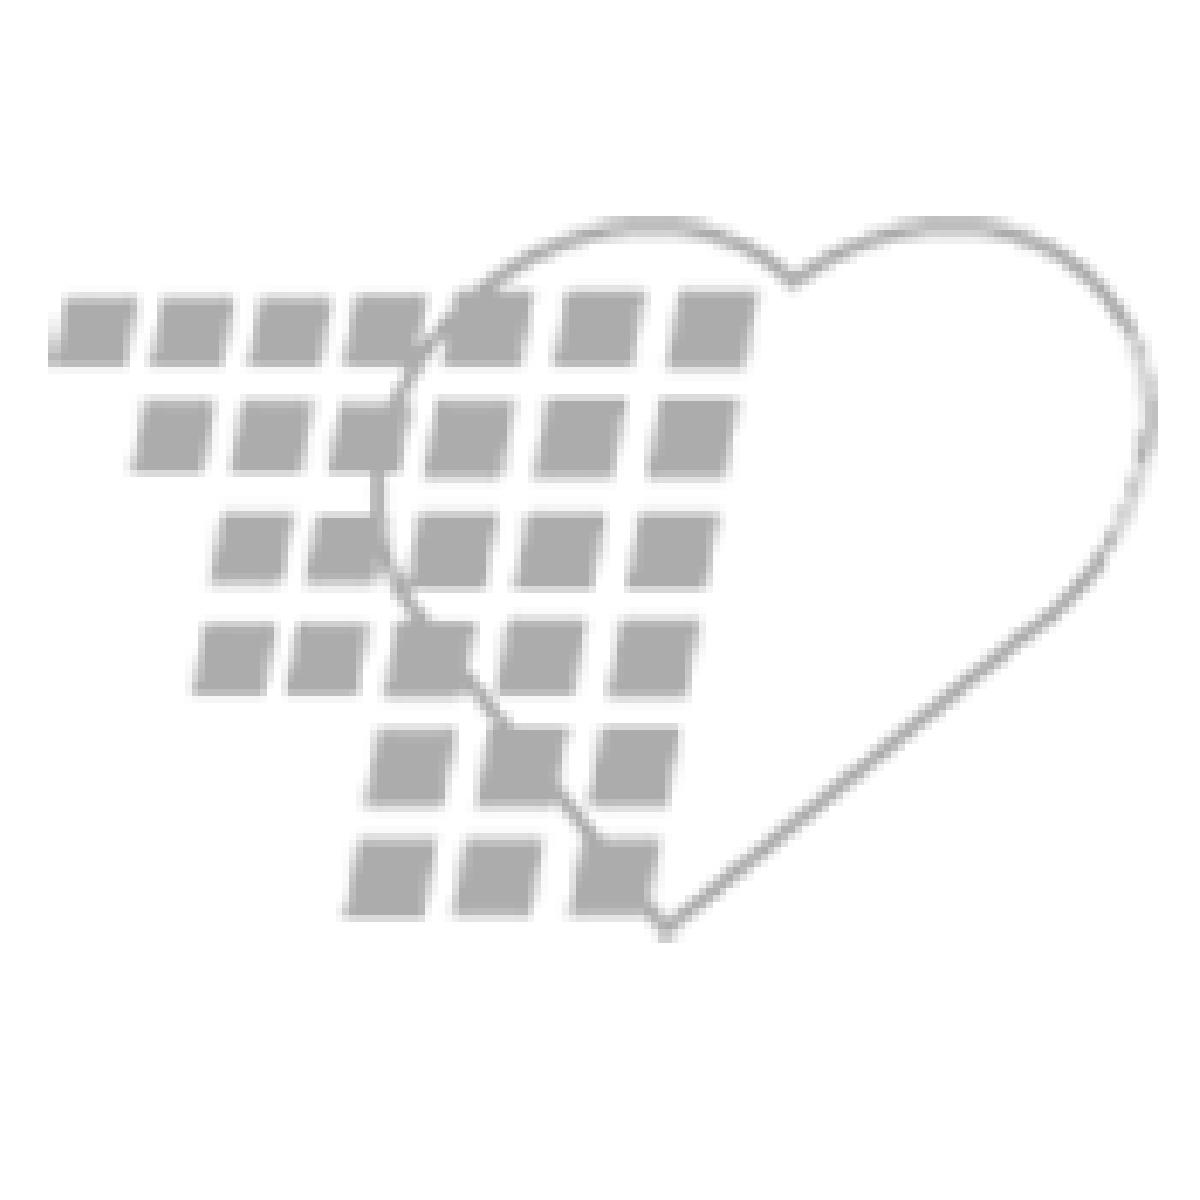 02-73-352 Metalite Reusable Penlight - White